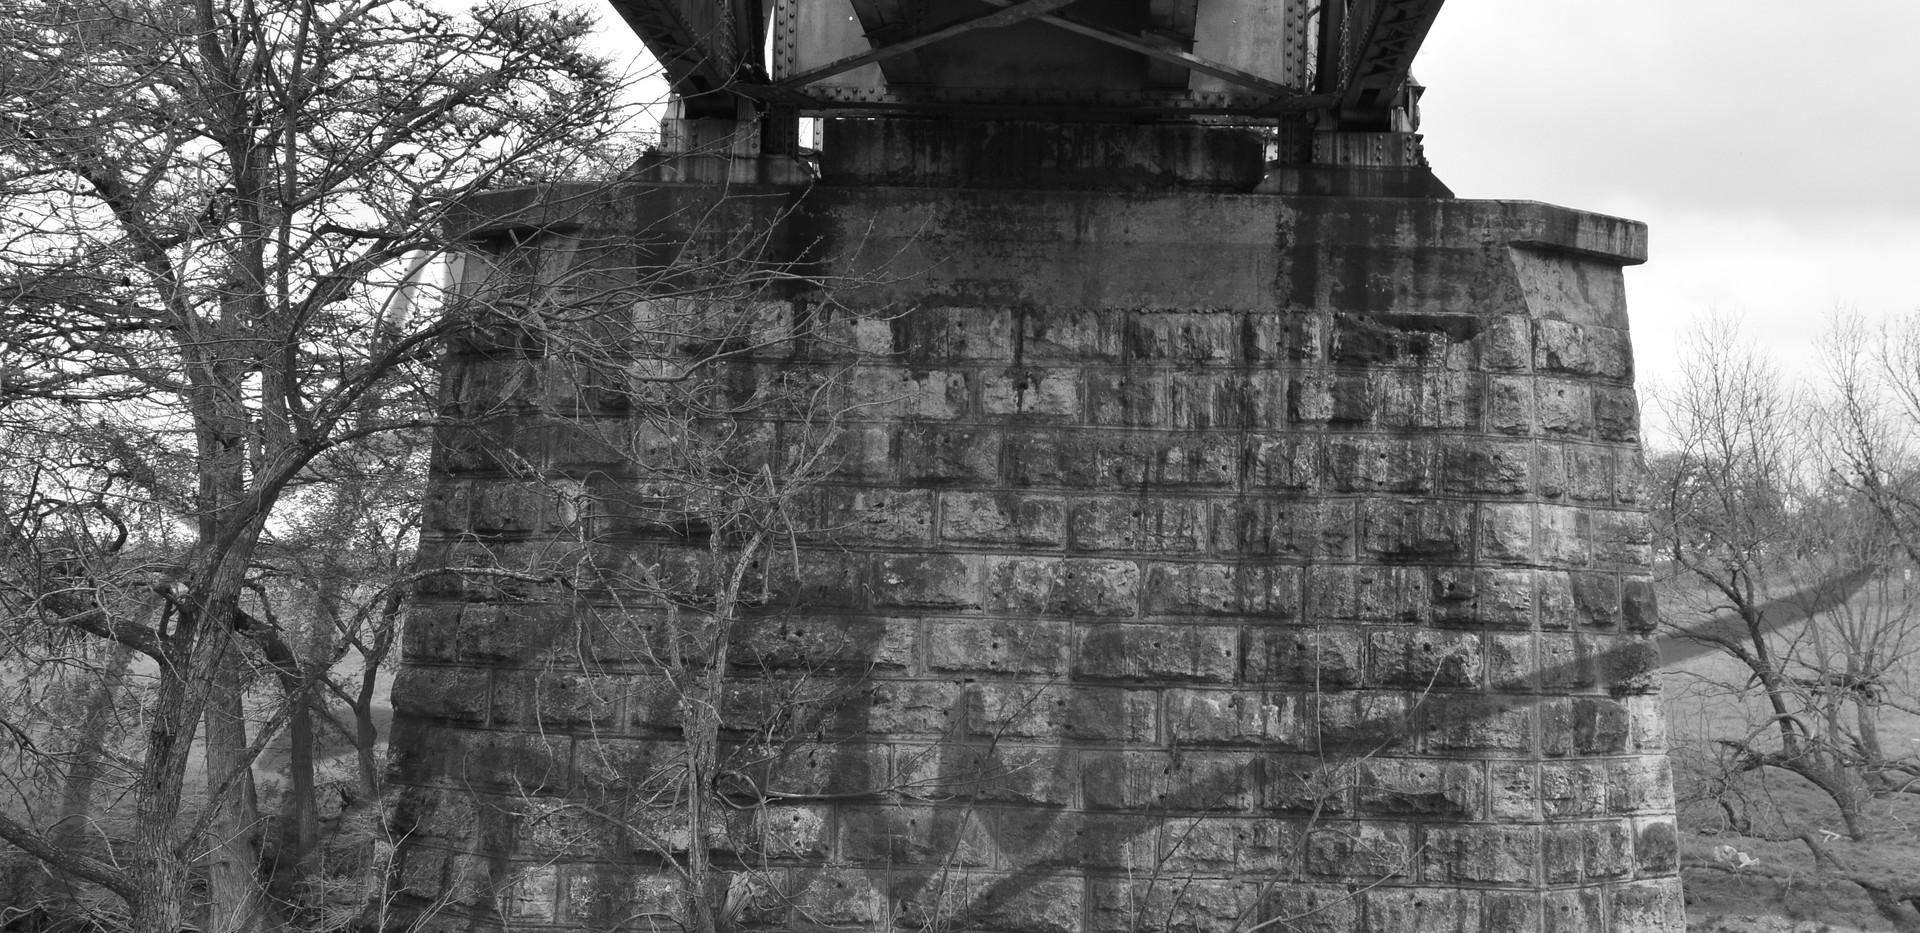 •Bridge Abutment, River Bend Rd.